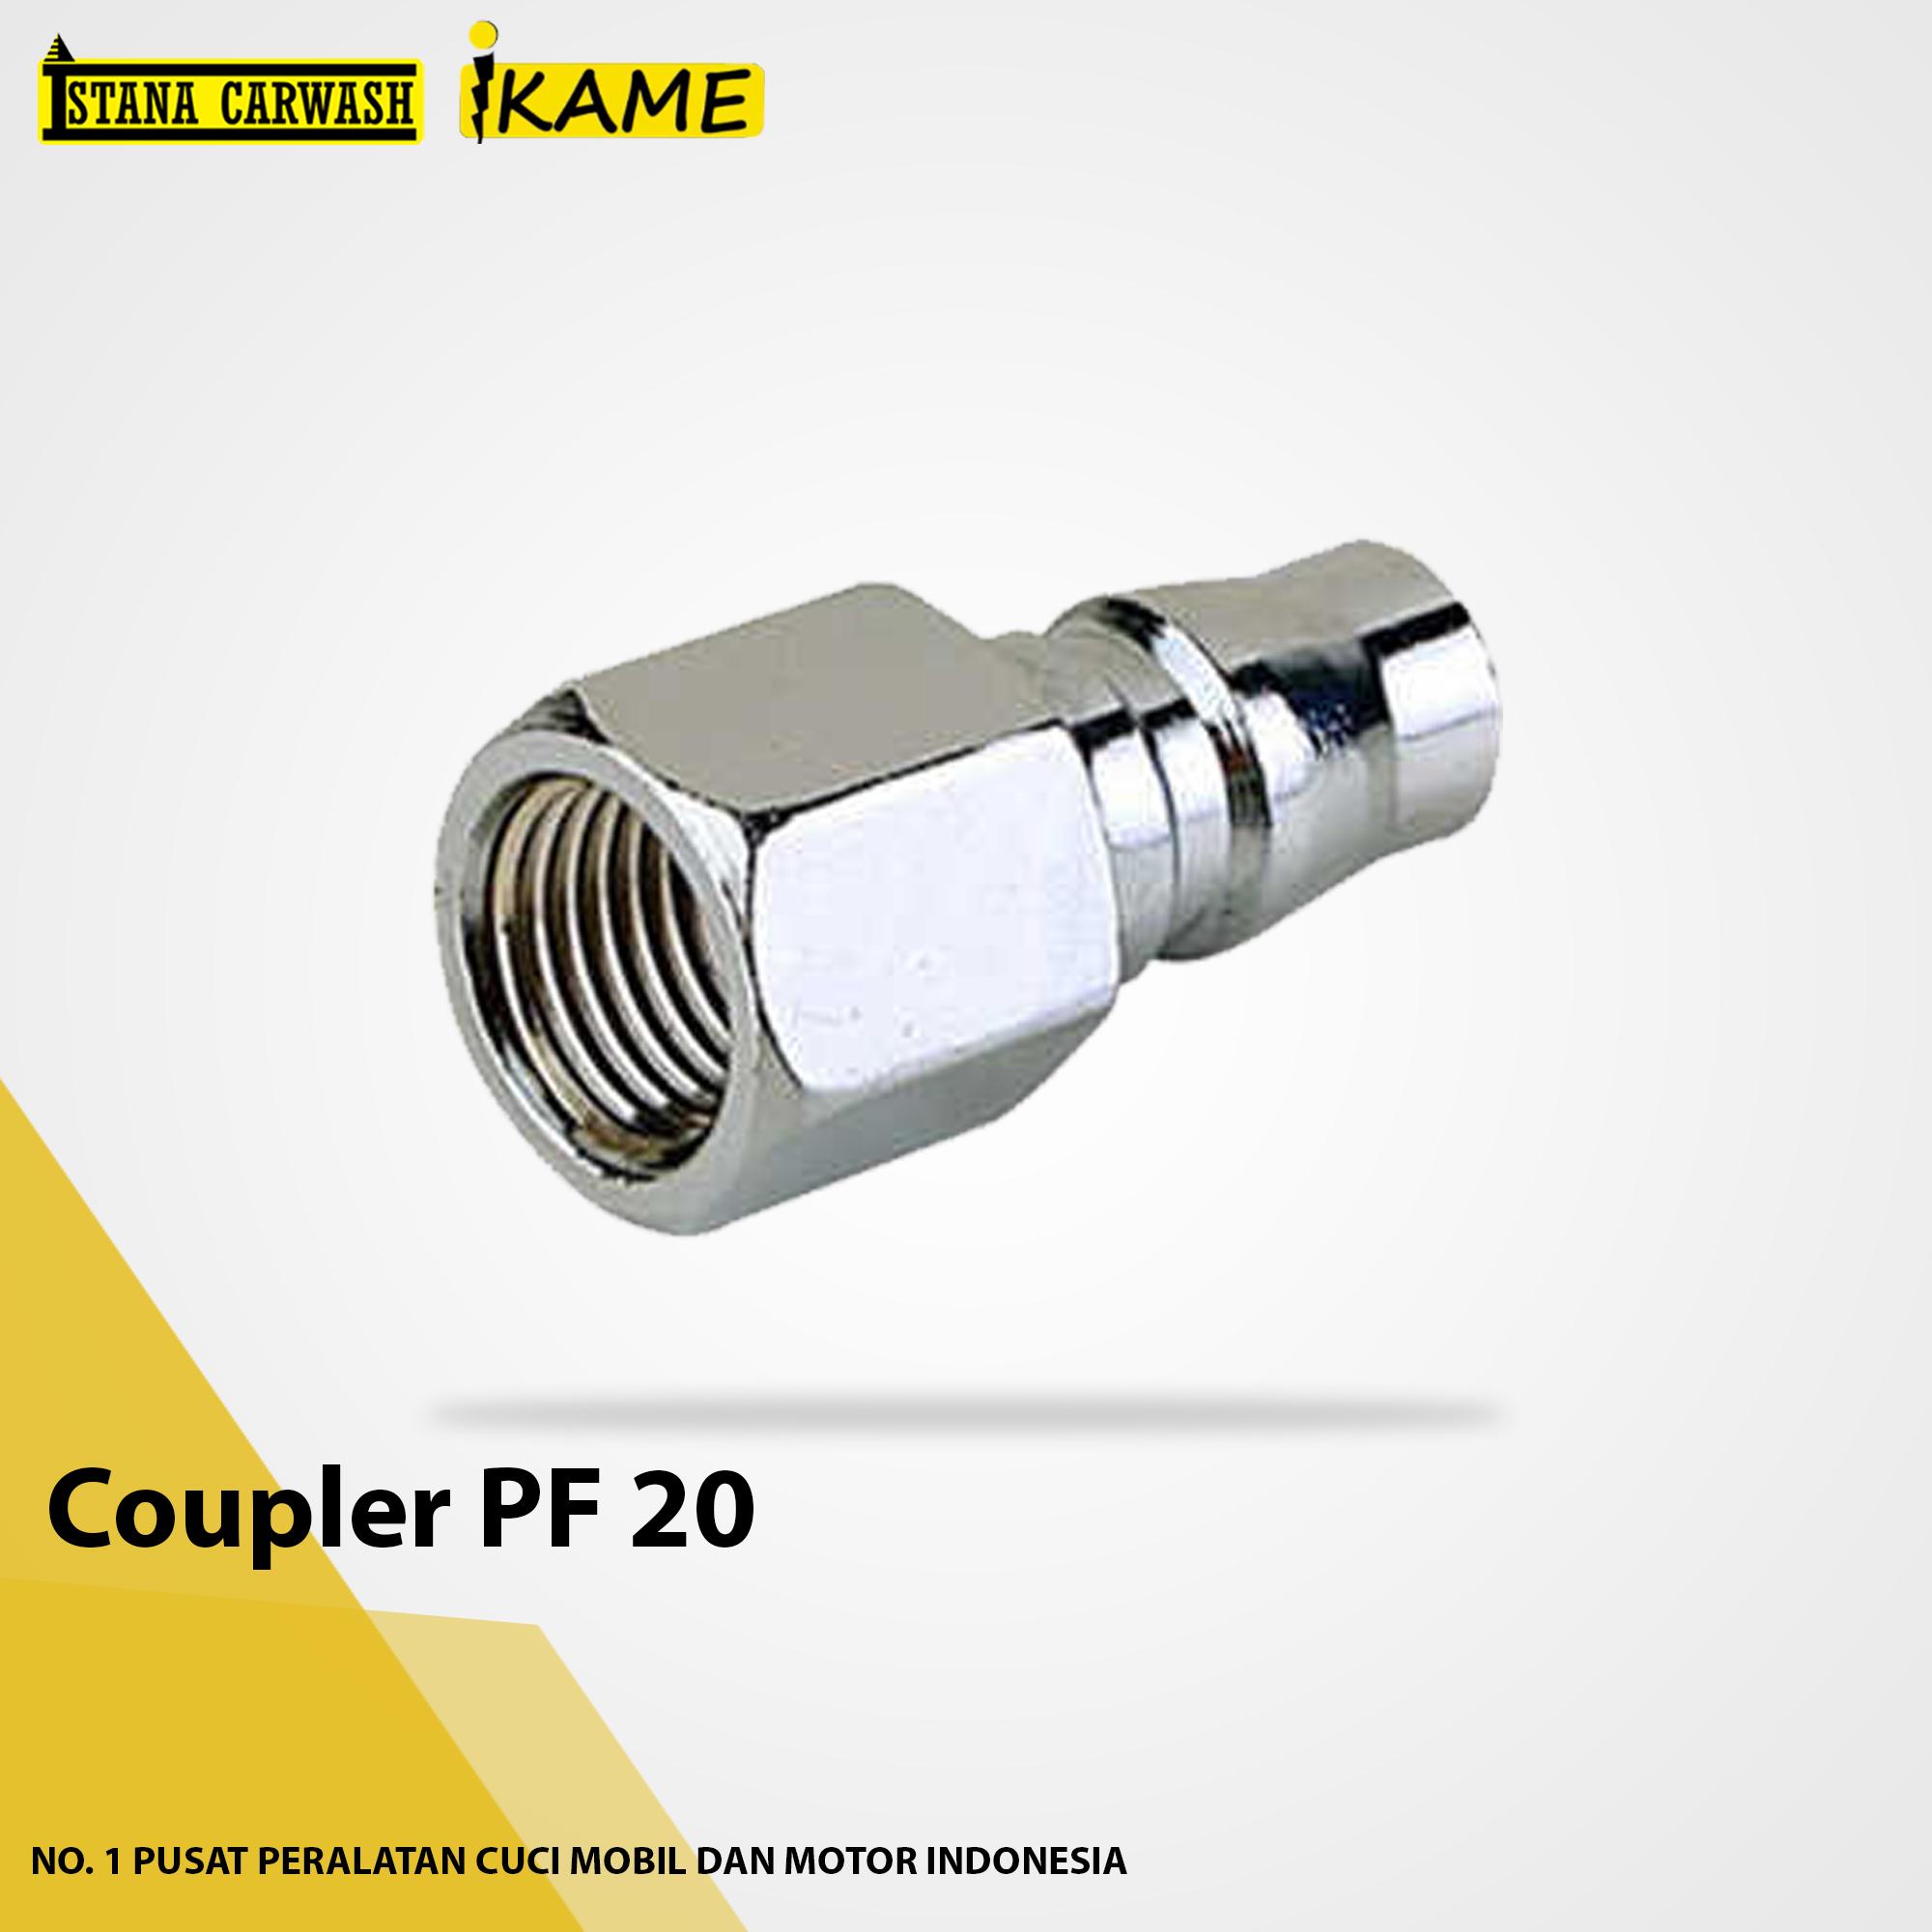 Coupler PF 20